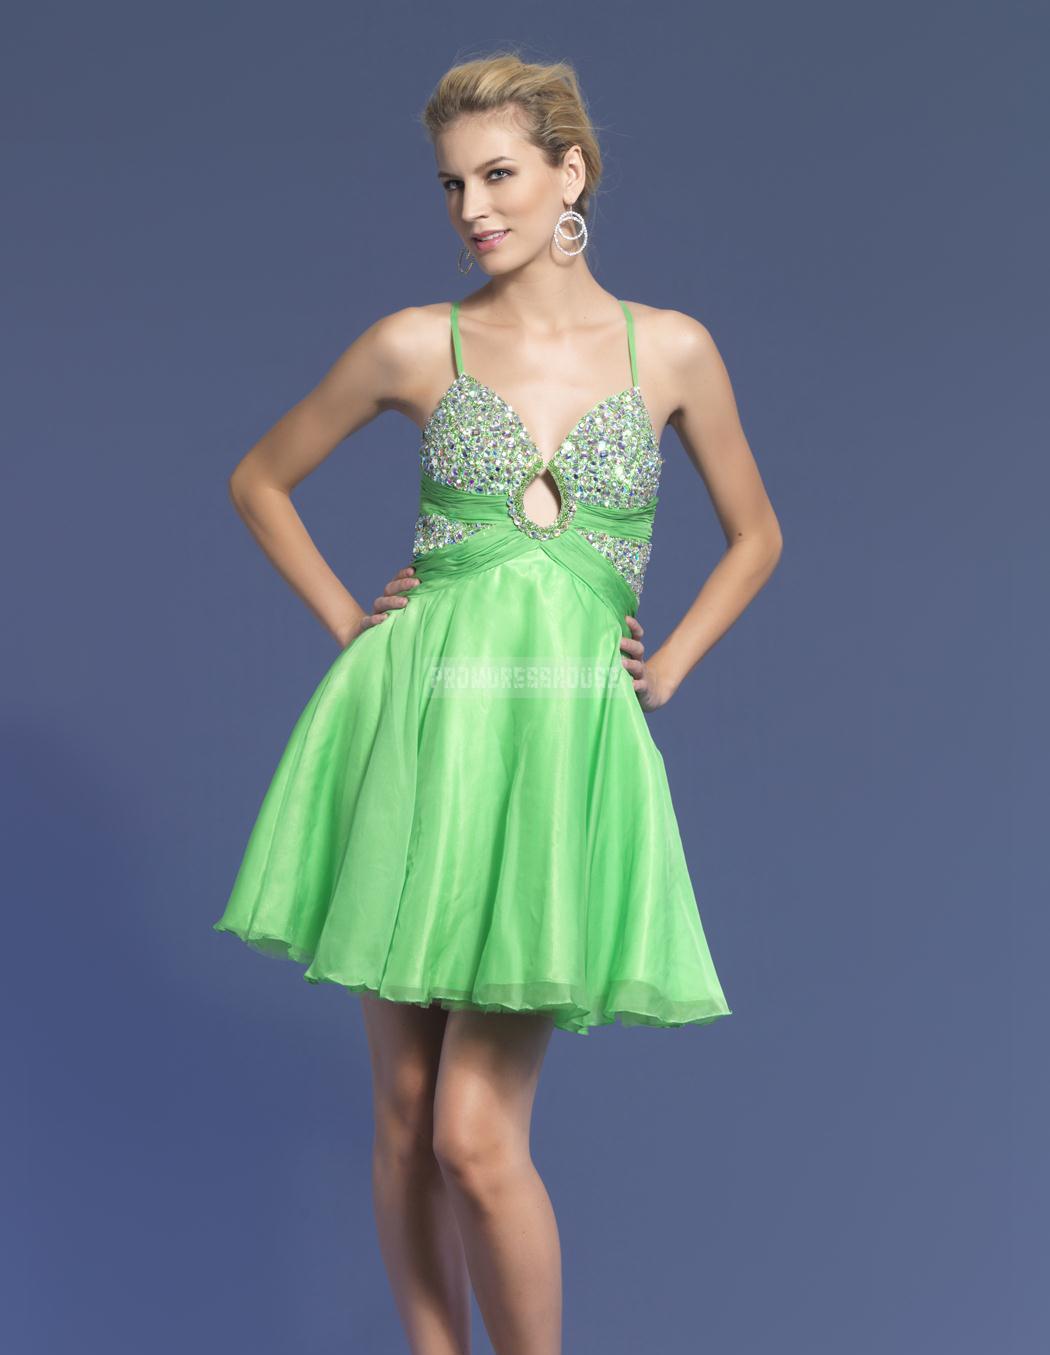 Organza Baby Doll Green Spaghetti Straps Beading Prom Dress - Promdresshouse.com